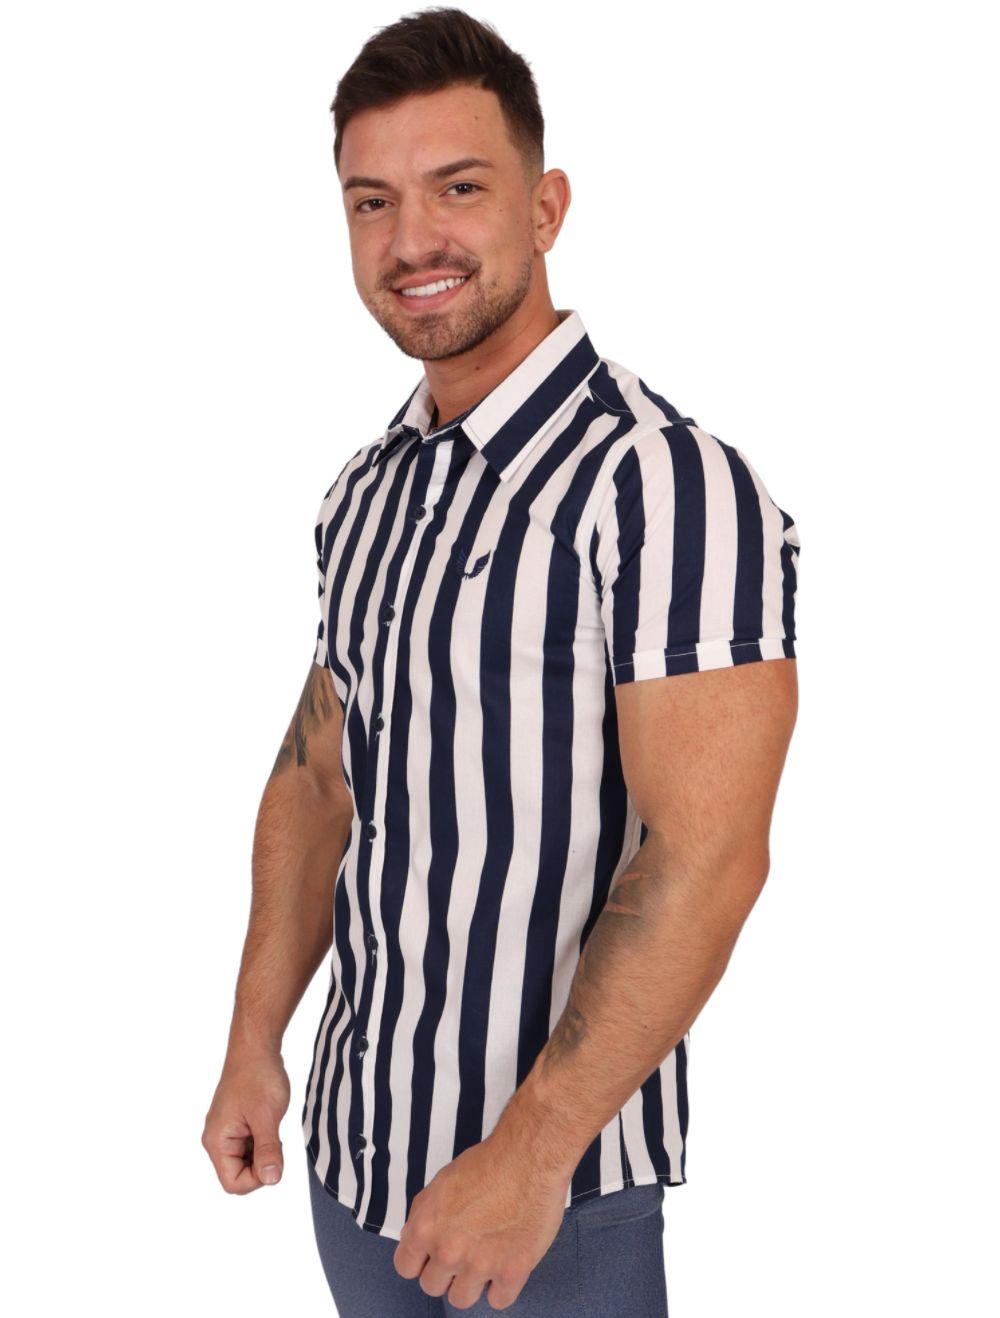 Camisa Masculina Manga Curta Slim Azul Marinho Listrada